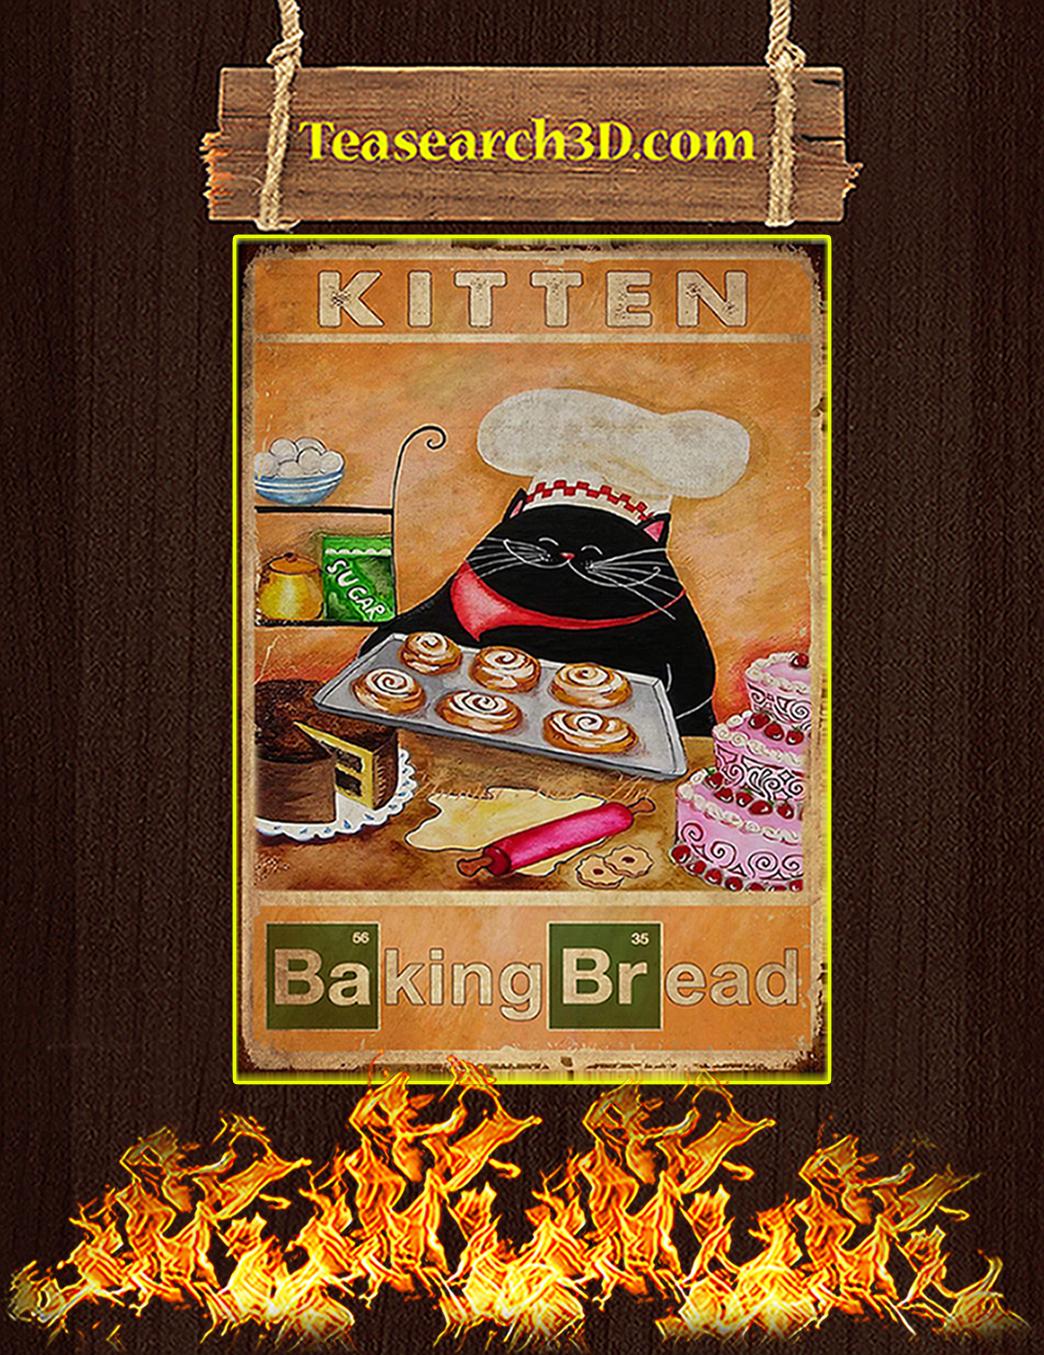 Kitten baking bread poster A1